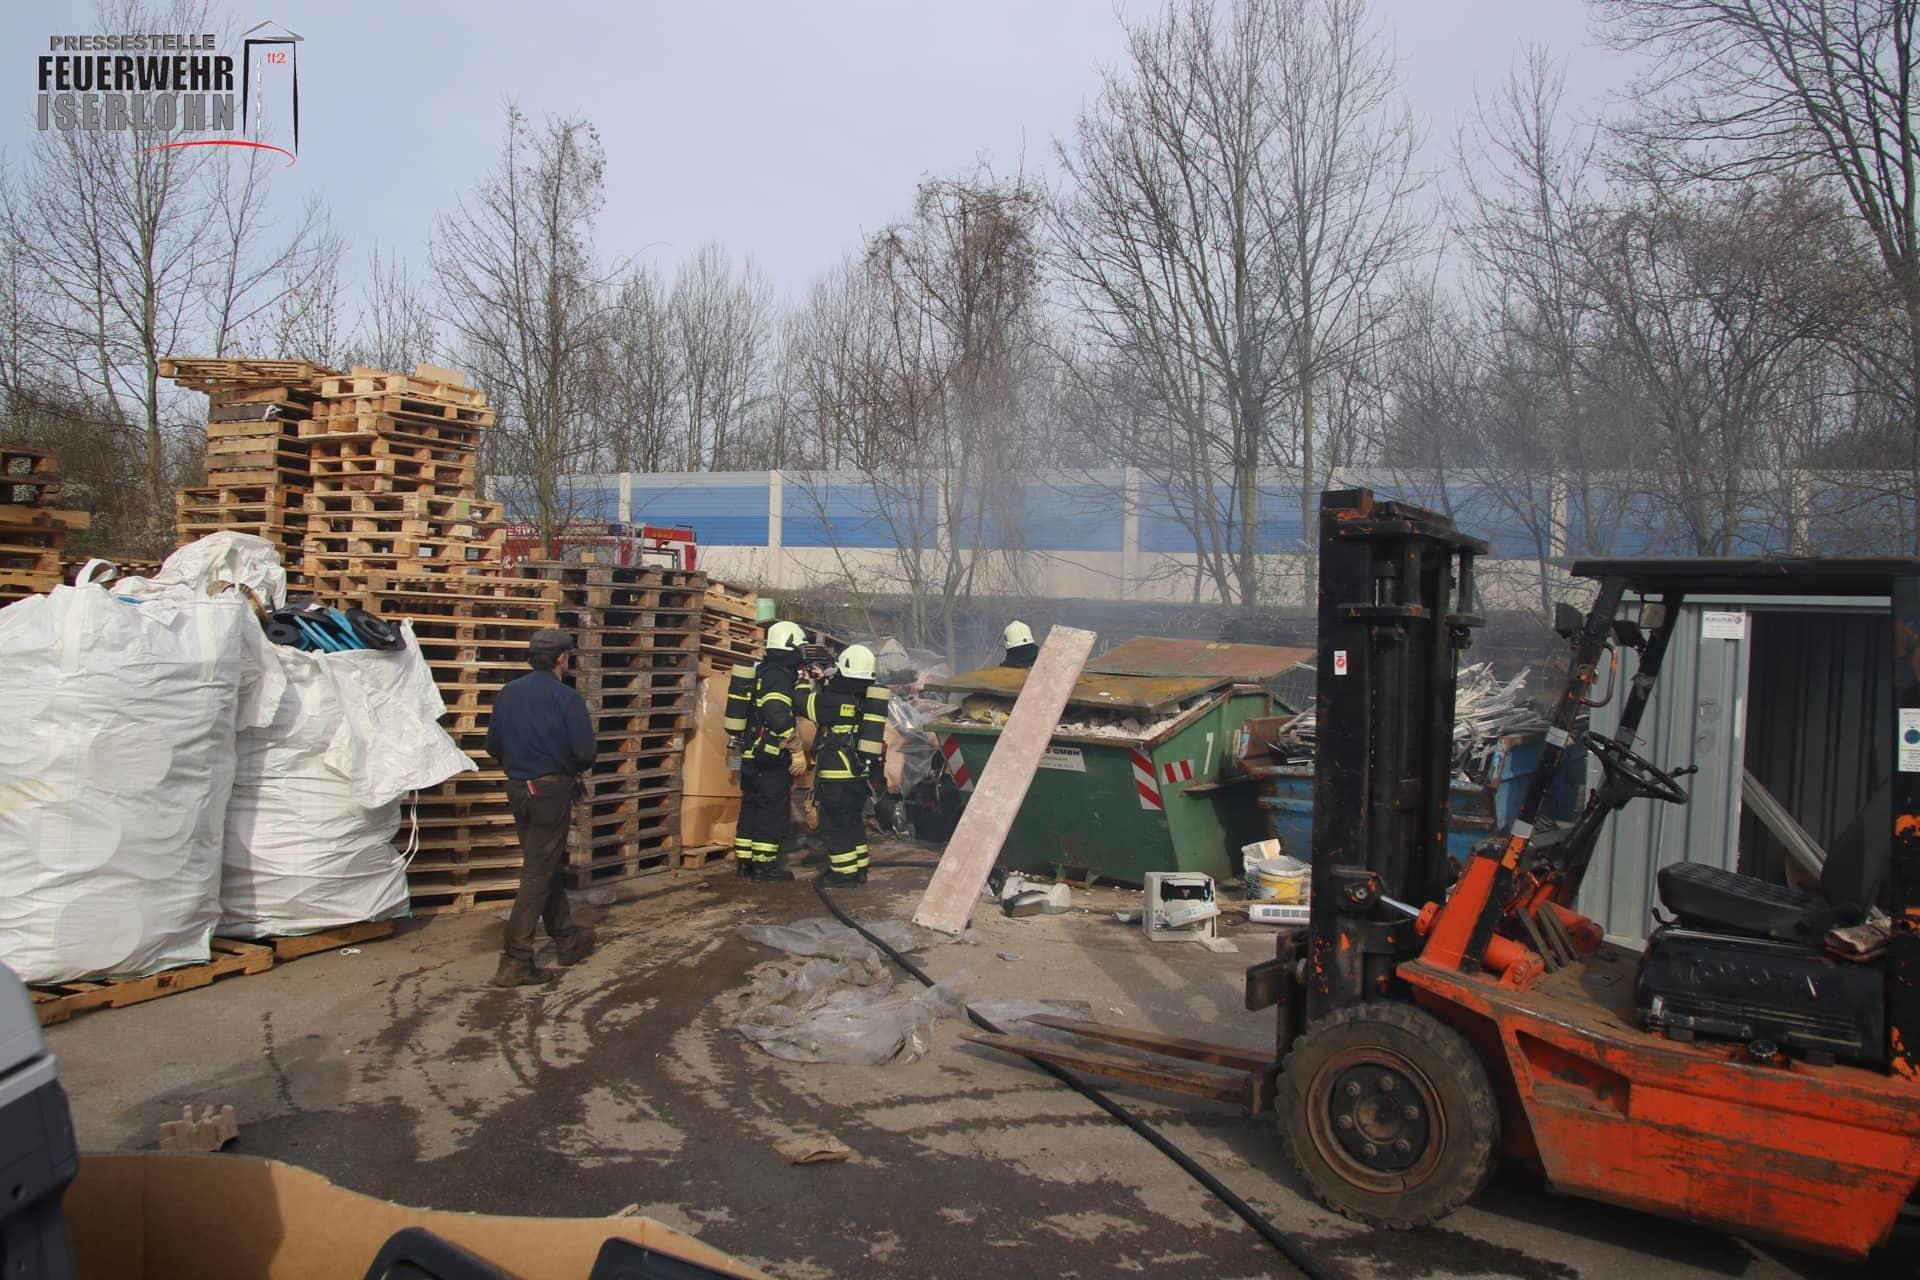 Brand auf einem Recyclinghof